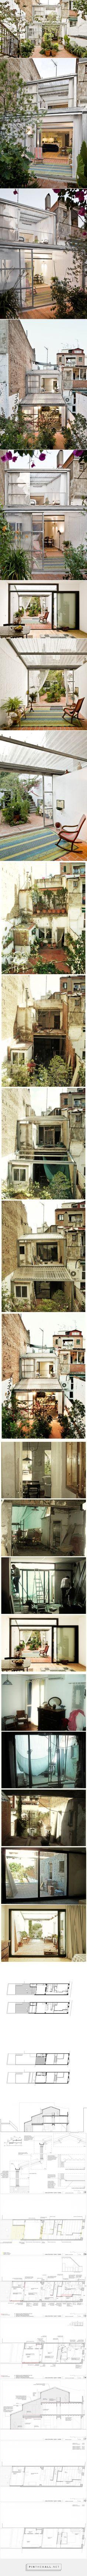 Jordi Adell > Reforma Casa Patio en Sants. Barcelona   HIC Arquitectura… Interior Ideas, Interior Design, Casa Patio, Restore, Interior Architecture, Townhouse, The Row, Restoration, Barcelona